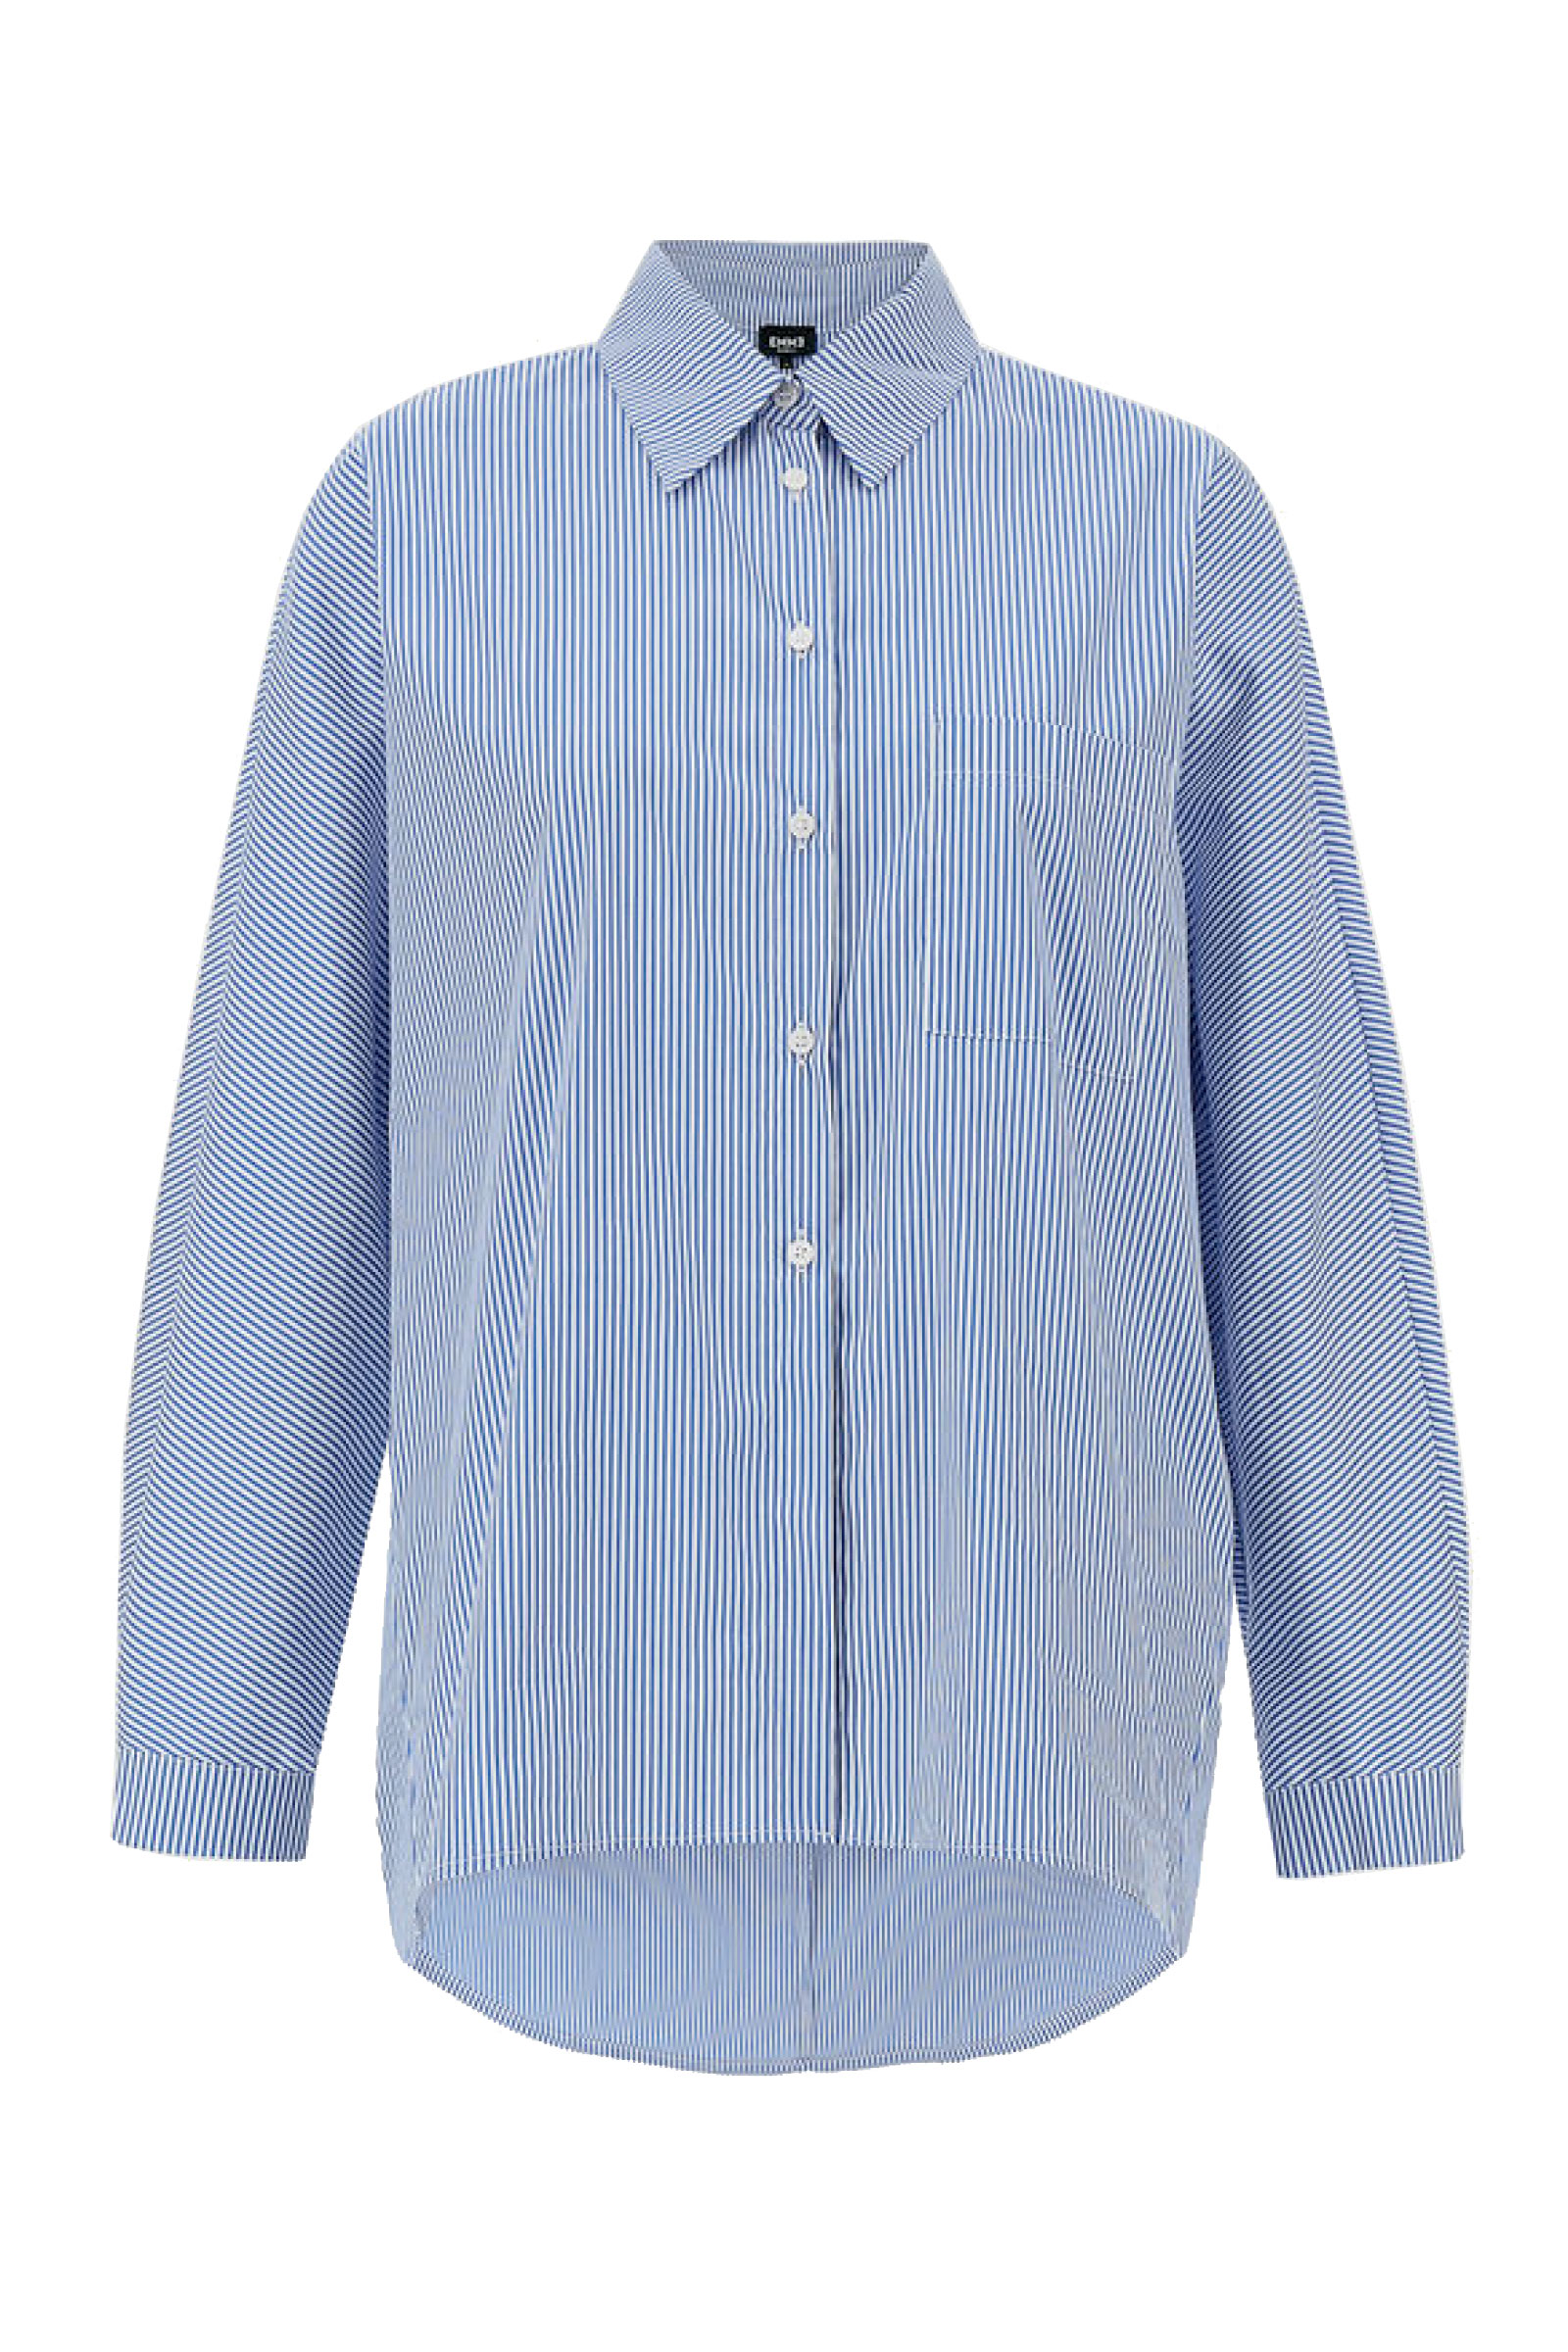 EMME MARELLA | Shirt | 51910115000003